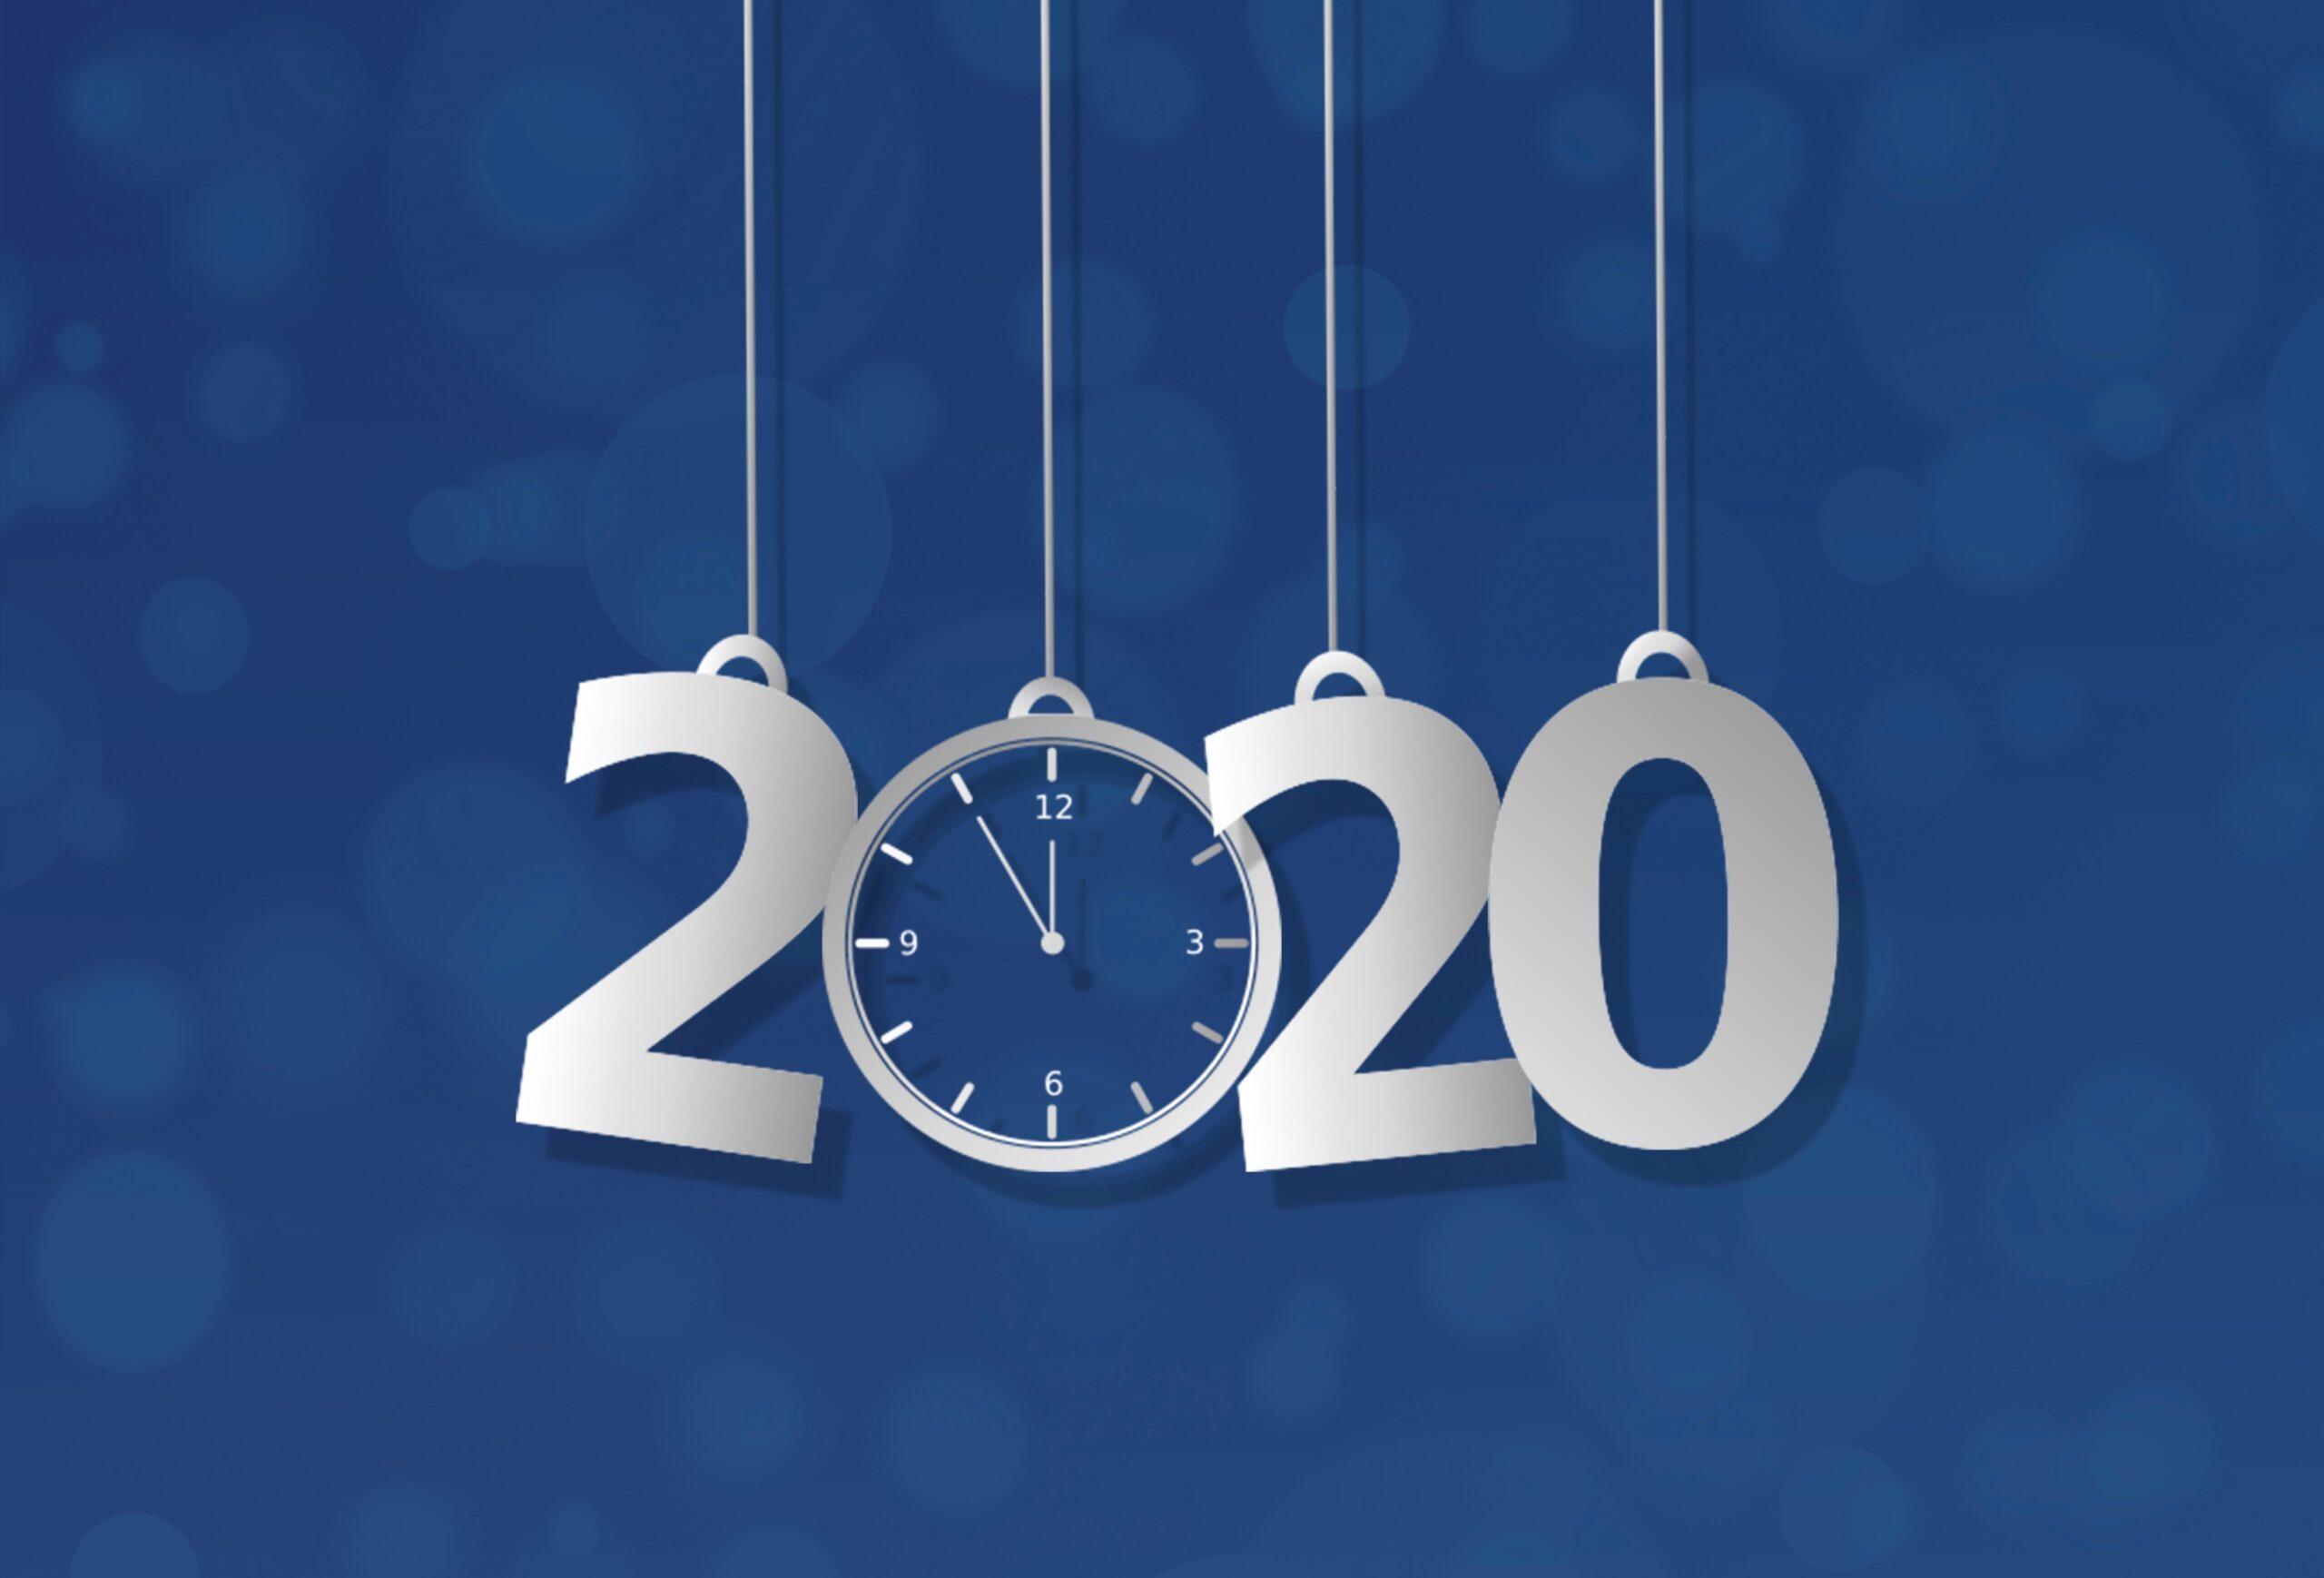 Review: Commission Citizenship Report 2020